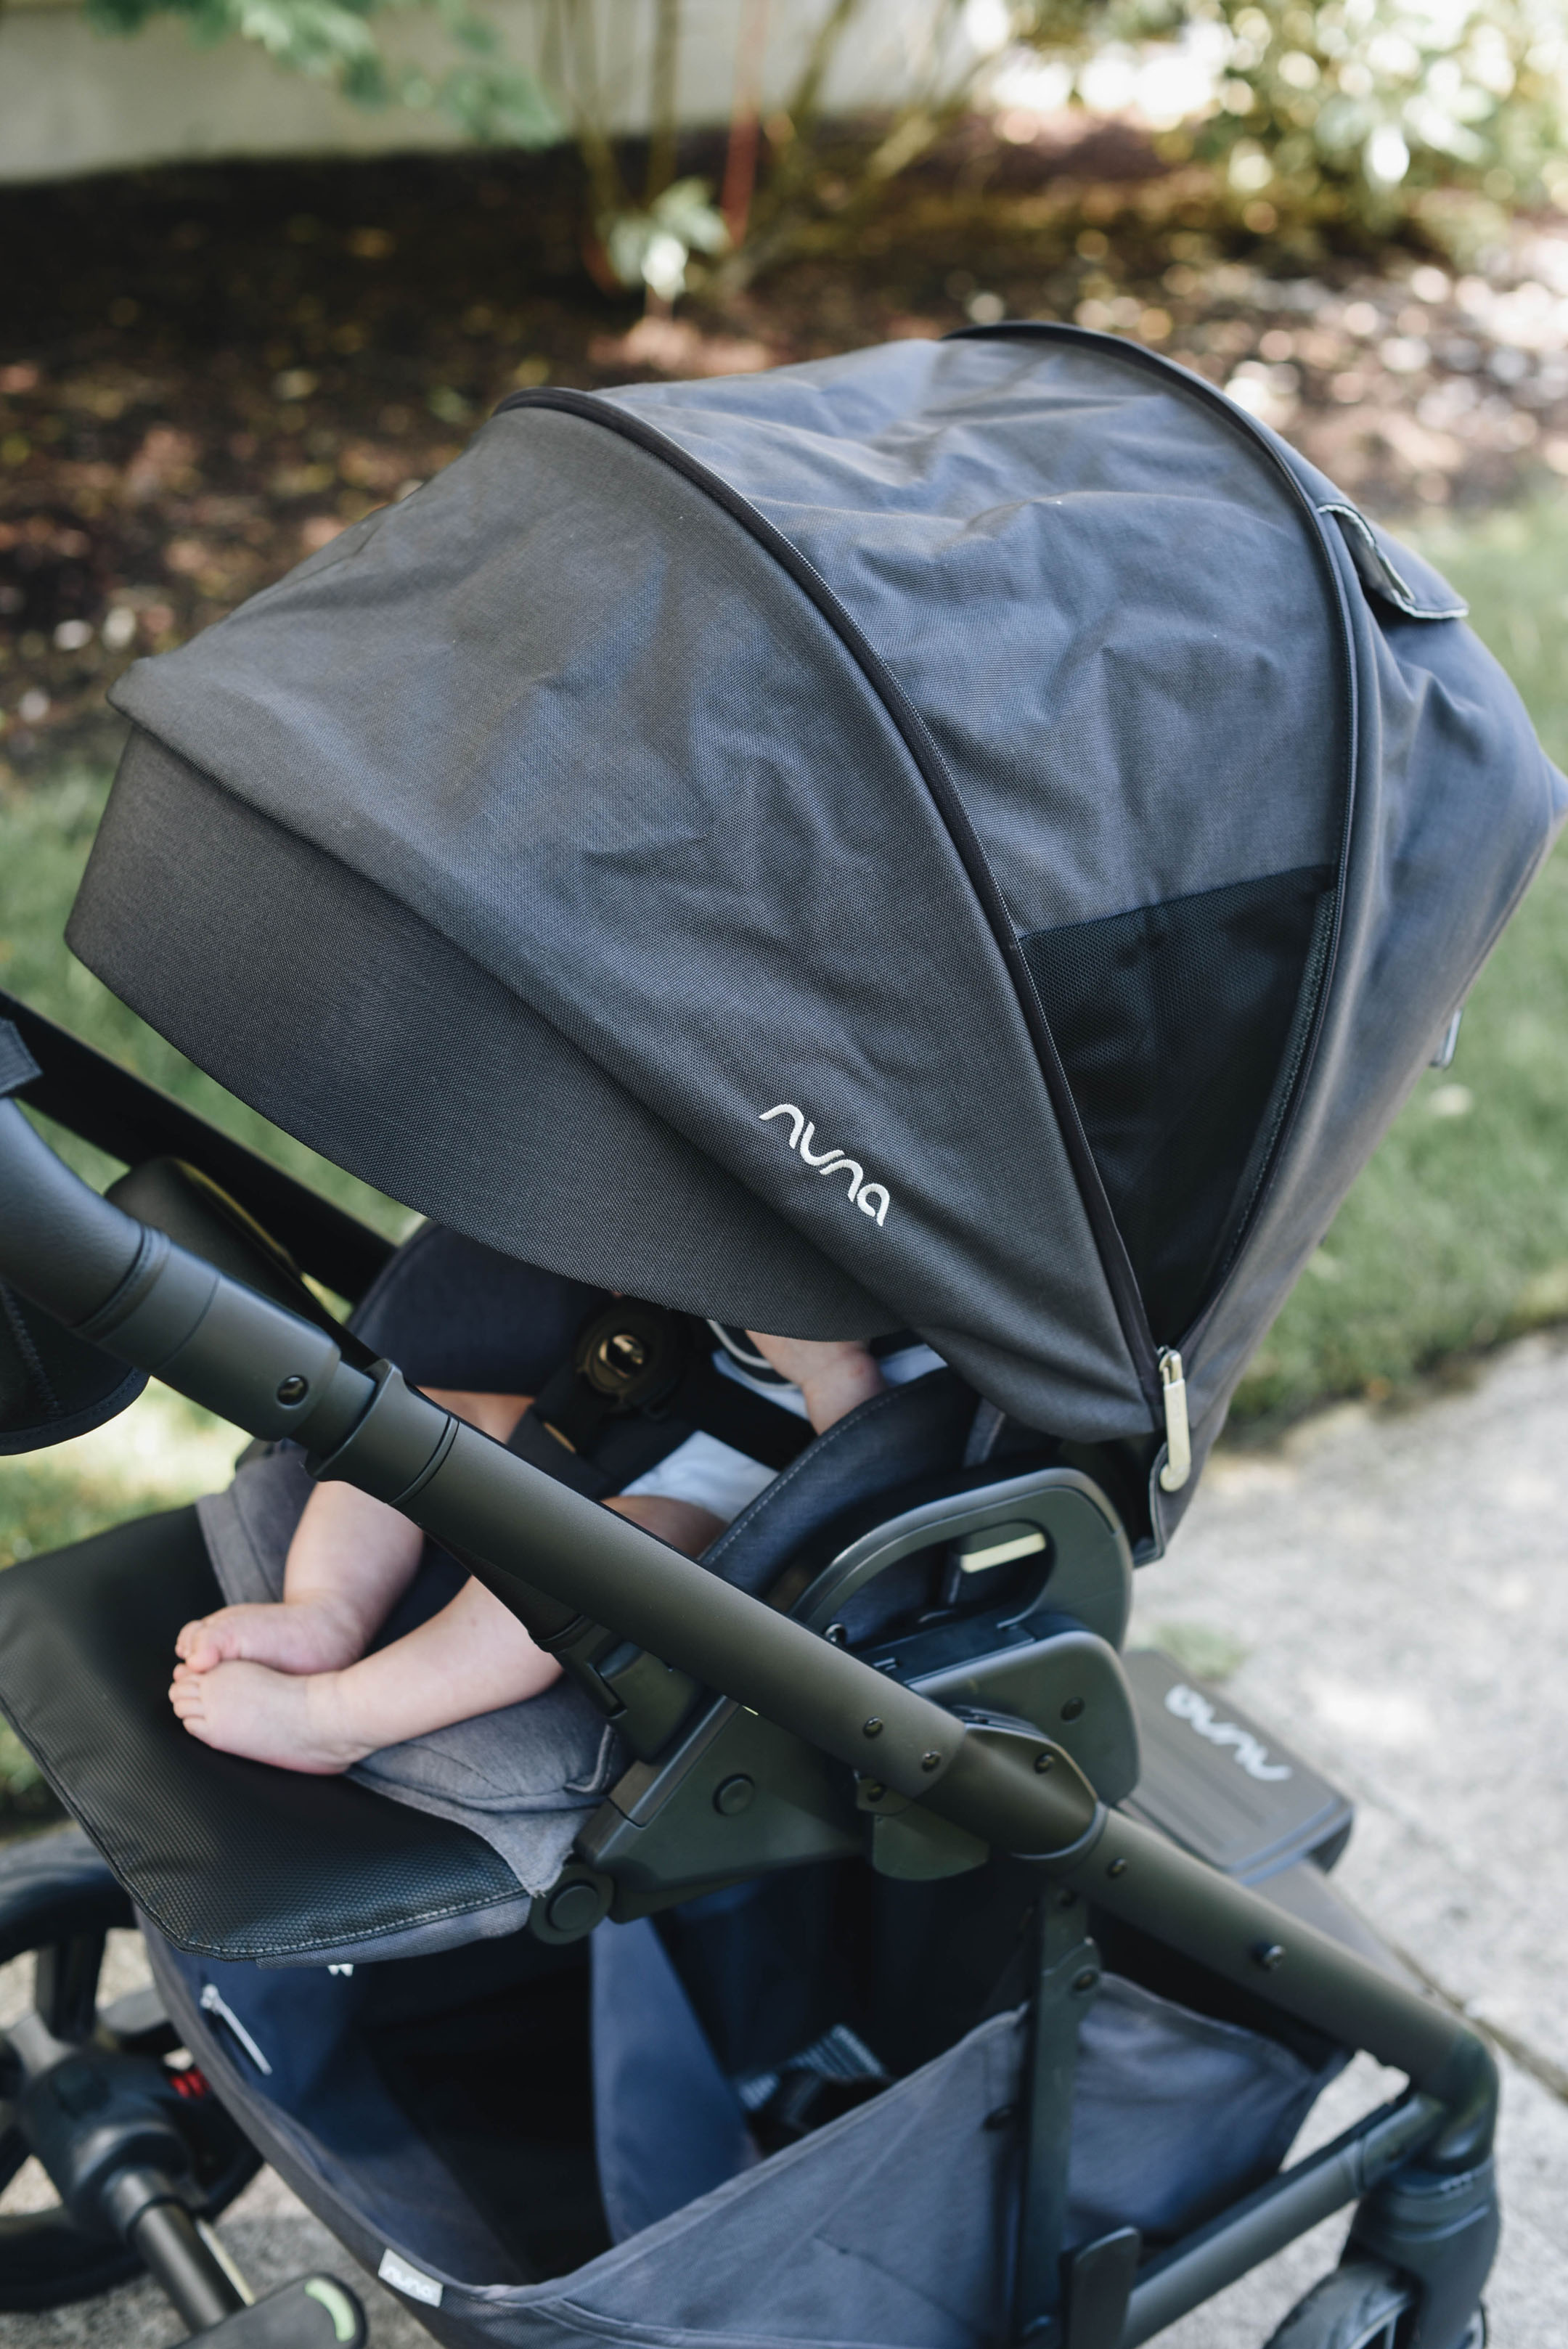 Nuna Mixx Stroller system gray